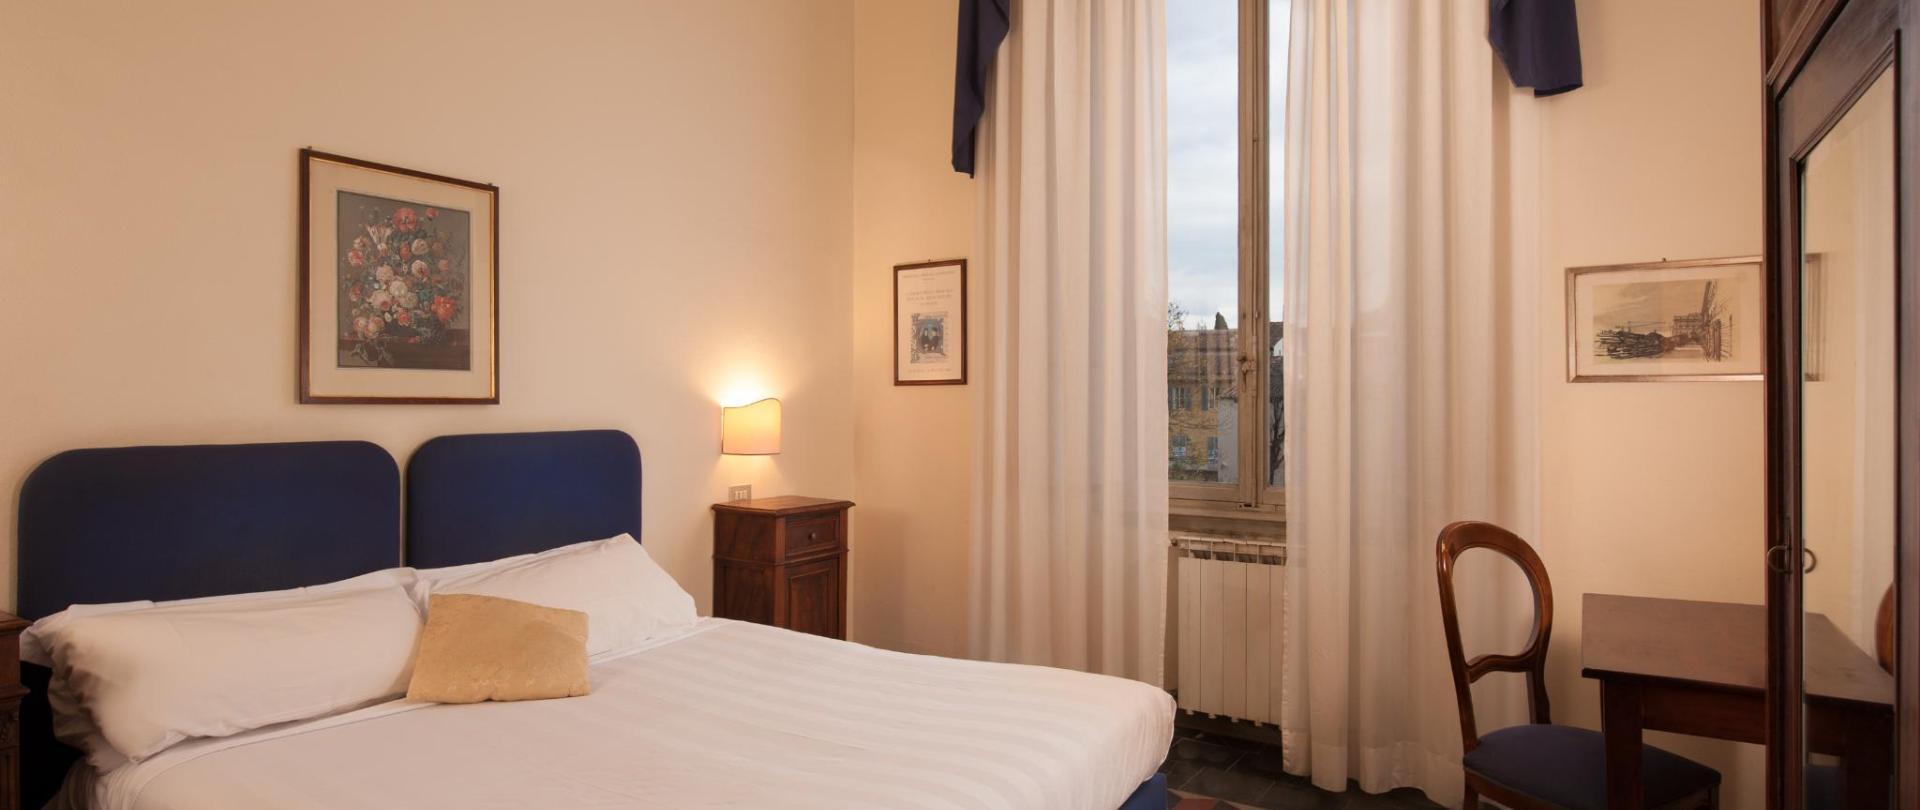 hotelannalena-32.jpg